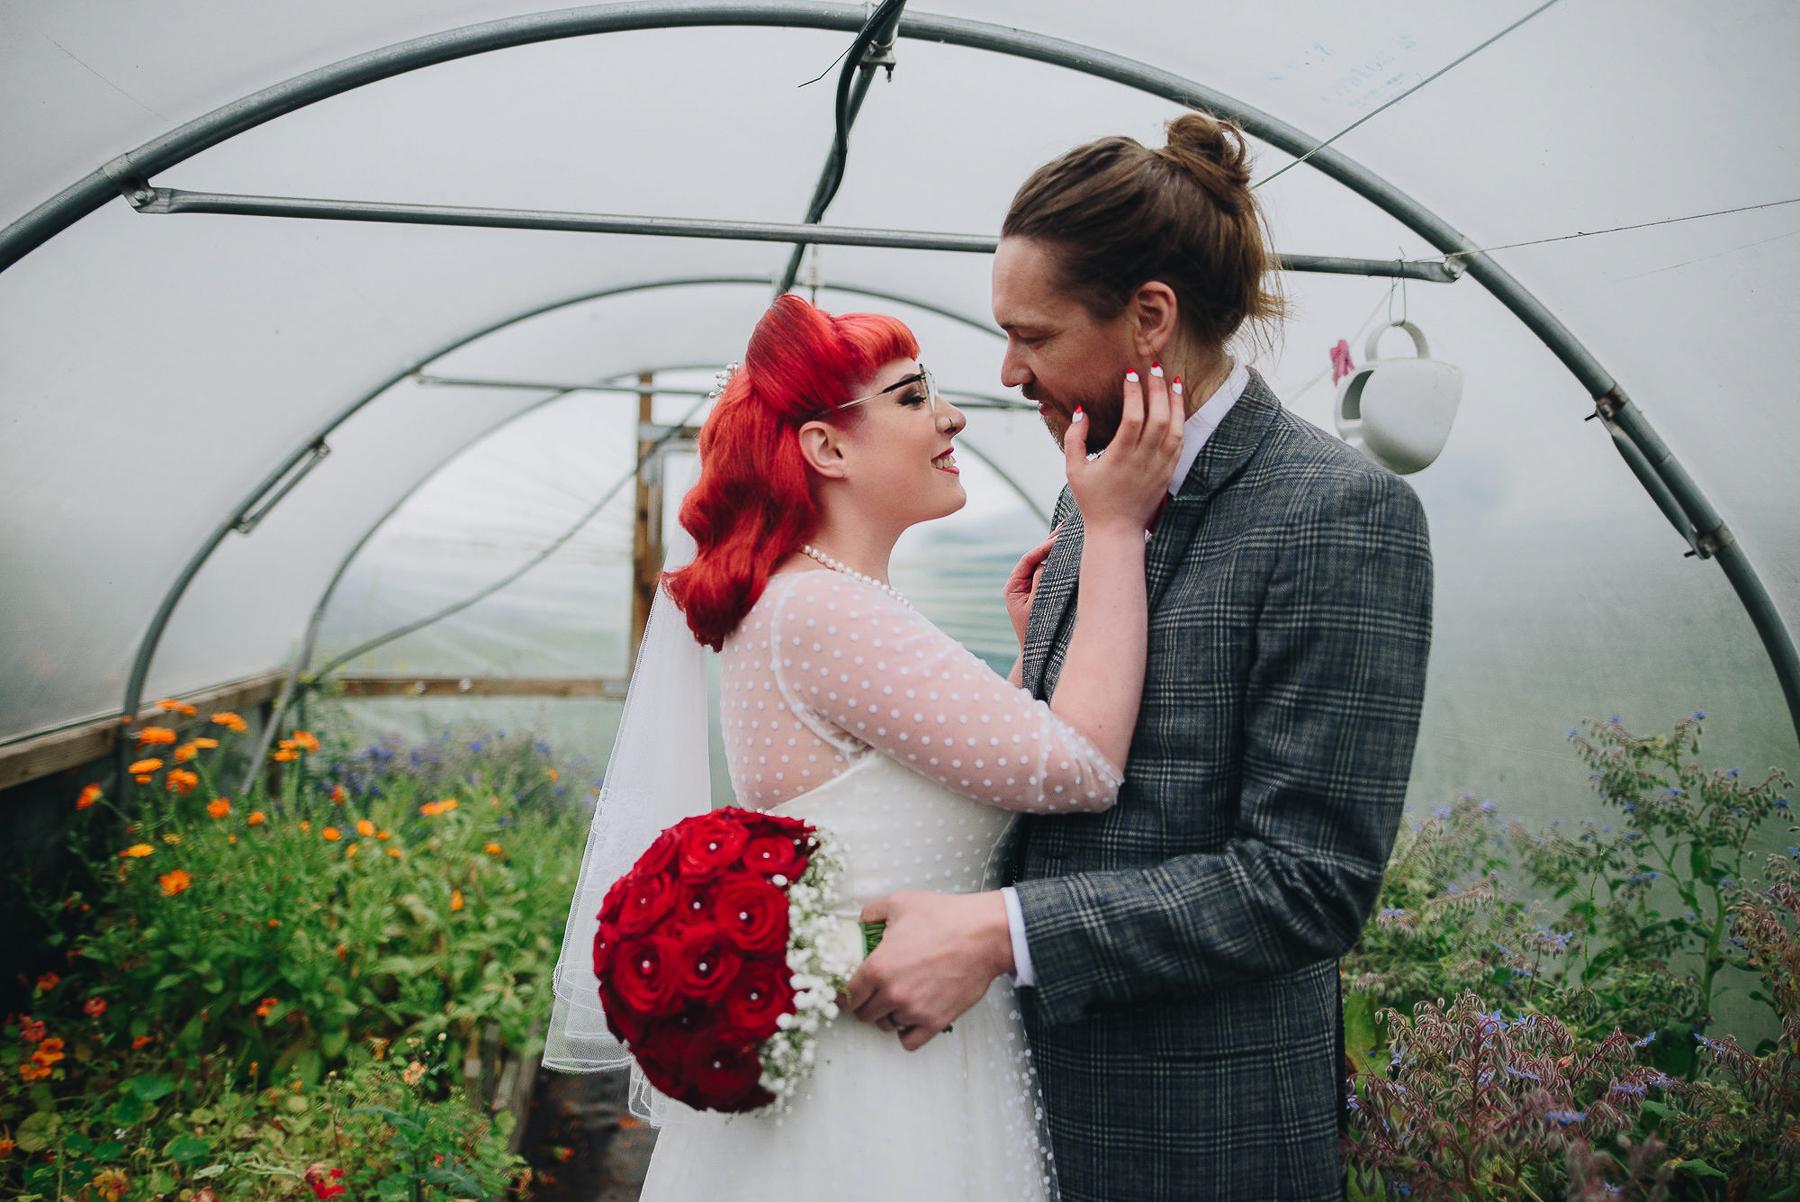 Wellbeing_Farm_Wedding_Photography_The_Pin-Up_Bride_Lara_Shaun-97.jpg